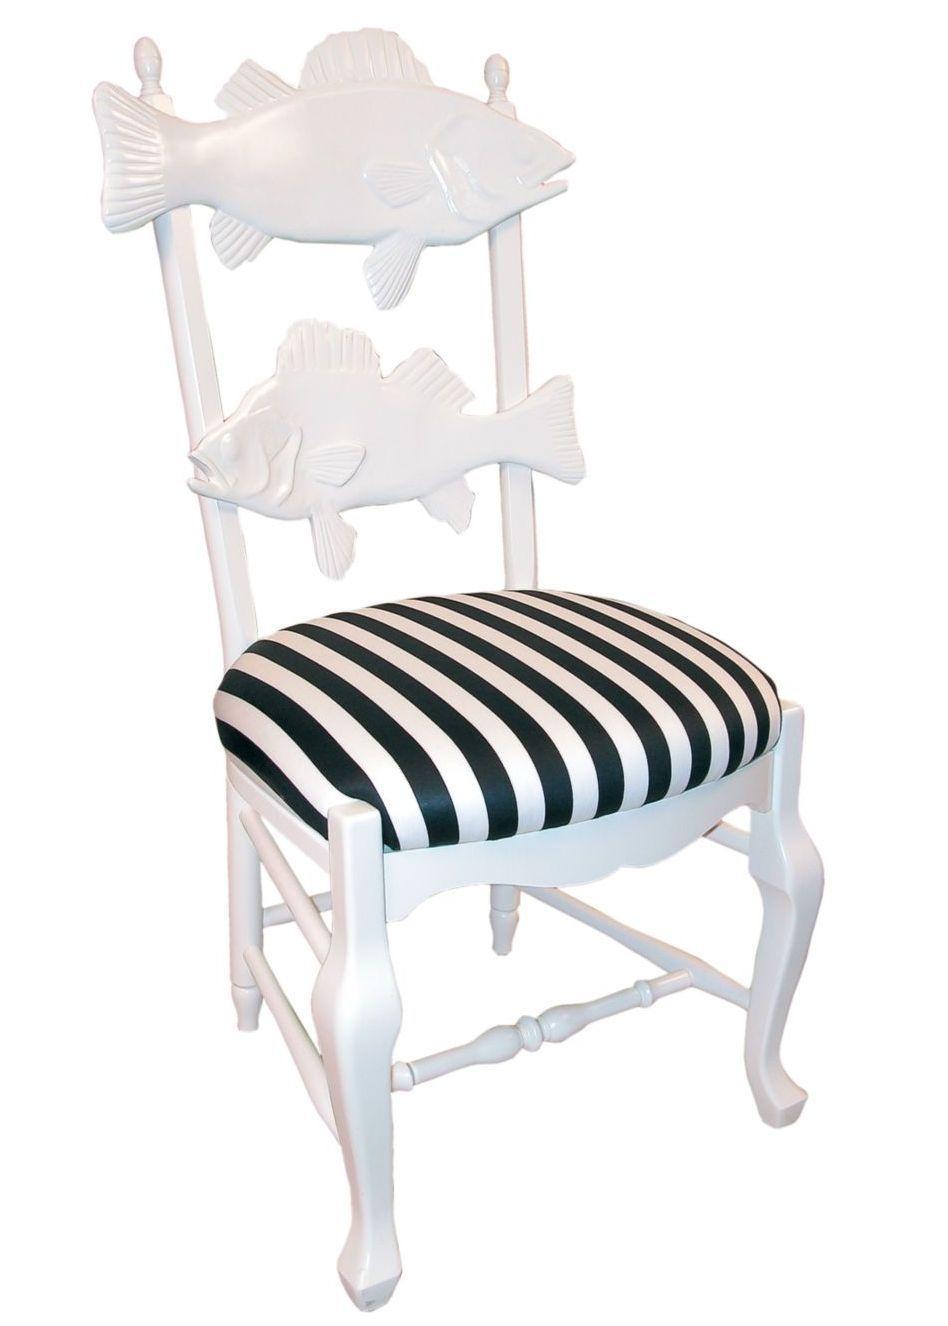 mackenzie childs cod fish chair mackenzie childs pinterest rh pinterest com fishnet dining chairs Dining Room Chairs